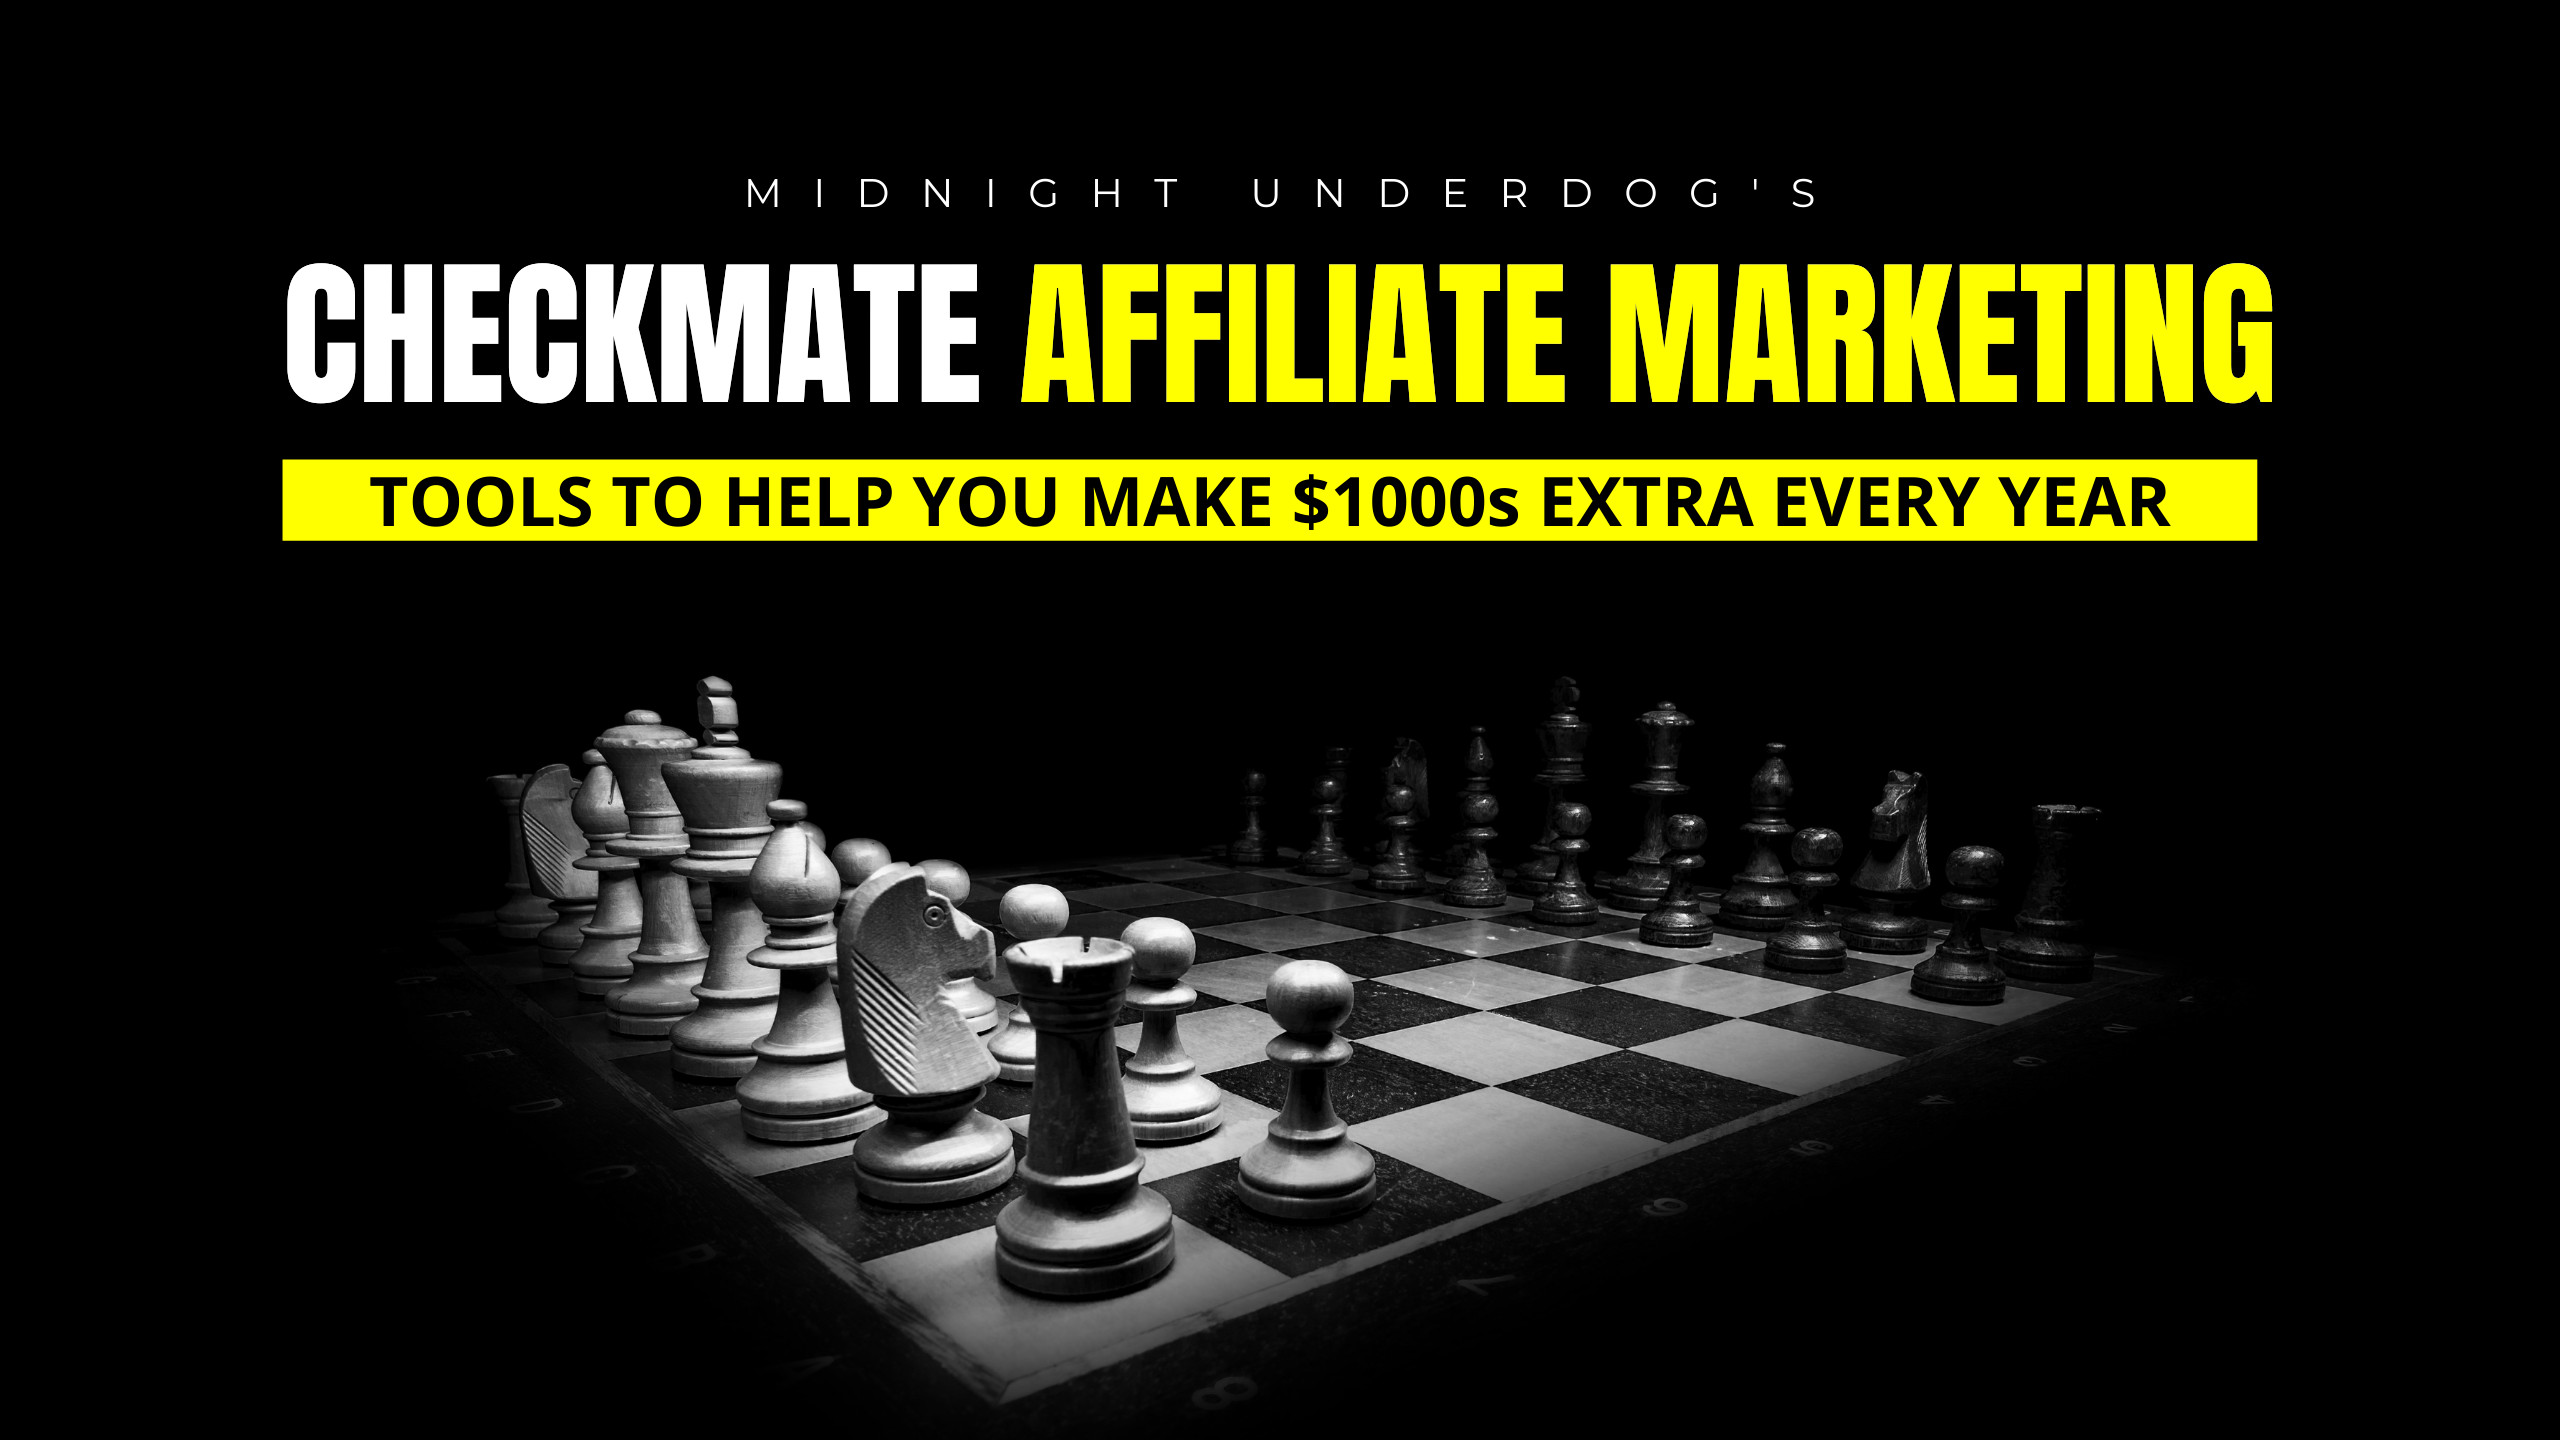 Checkmate Affiliate Marketing